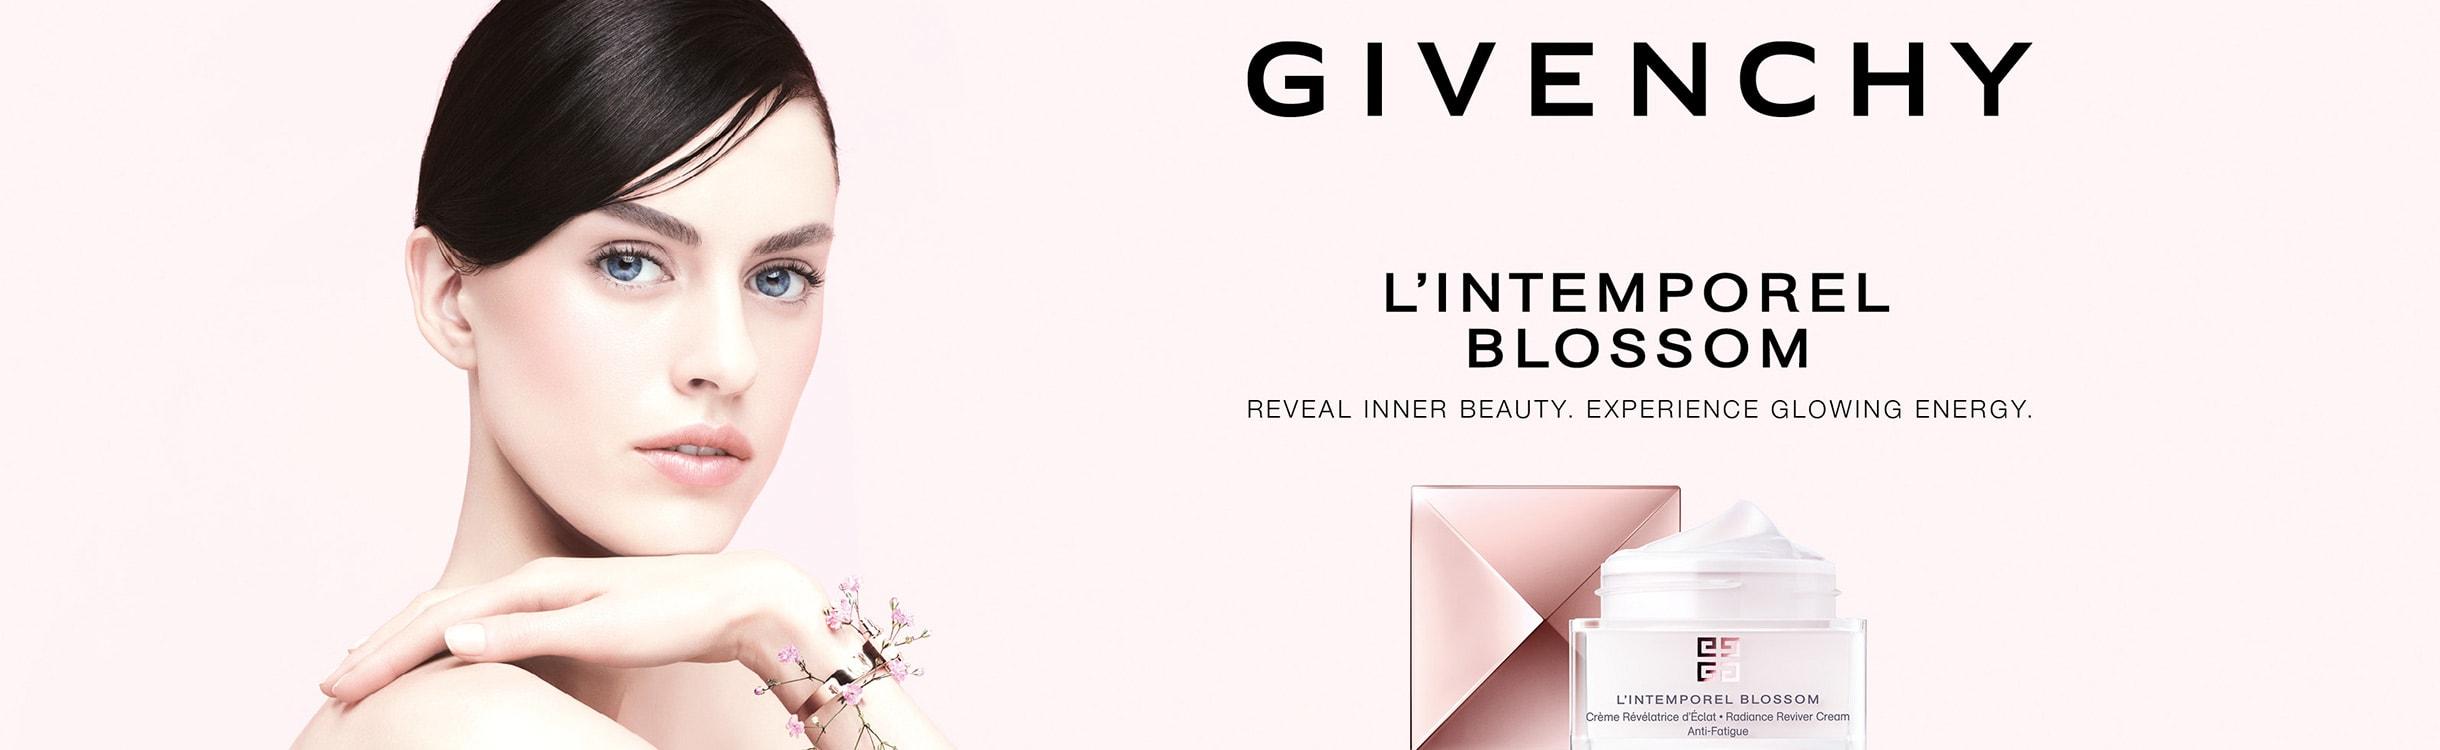 Maquiagem Givenchy